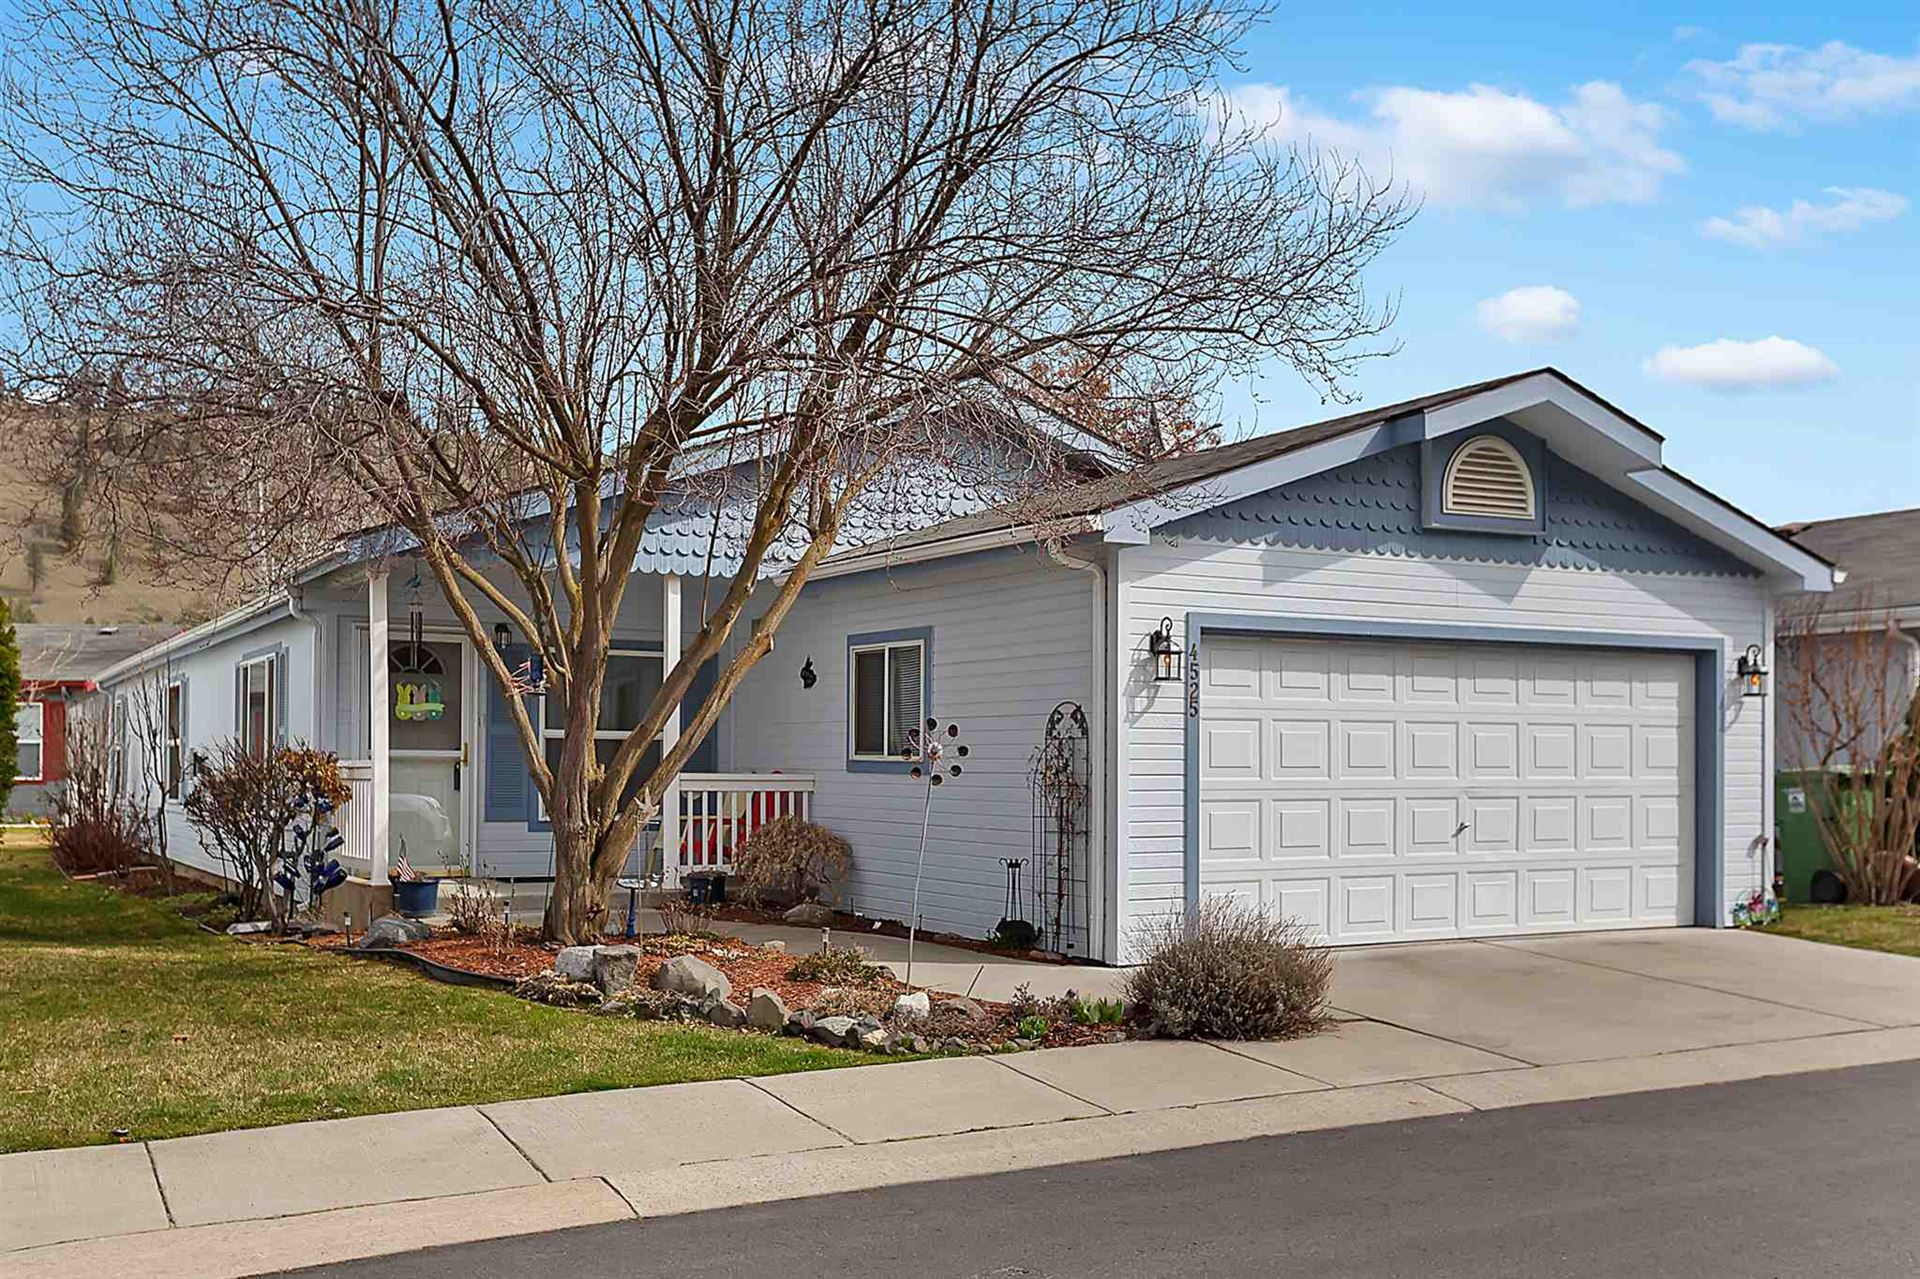 4525 S Sunny Creek Cir, Spokane, WA 99224-8461 - #: 202113545